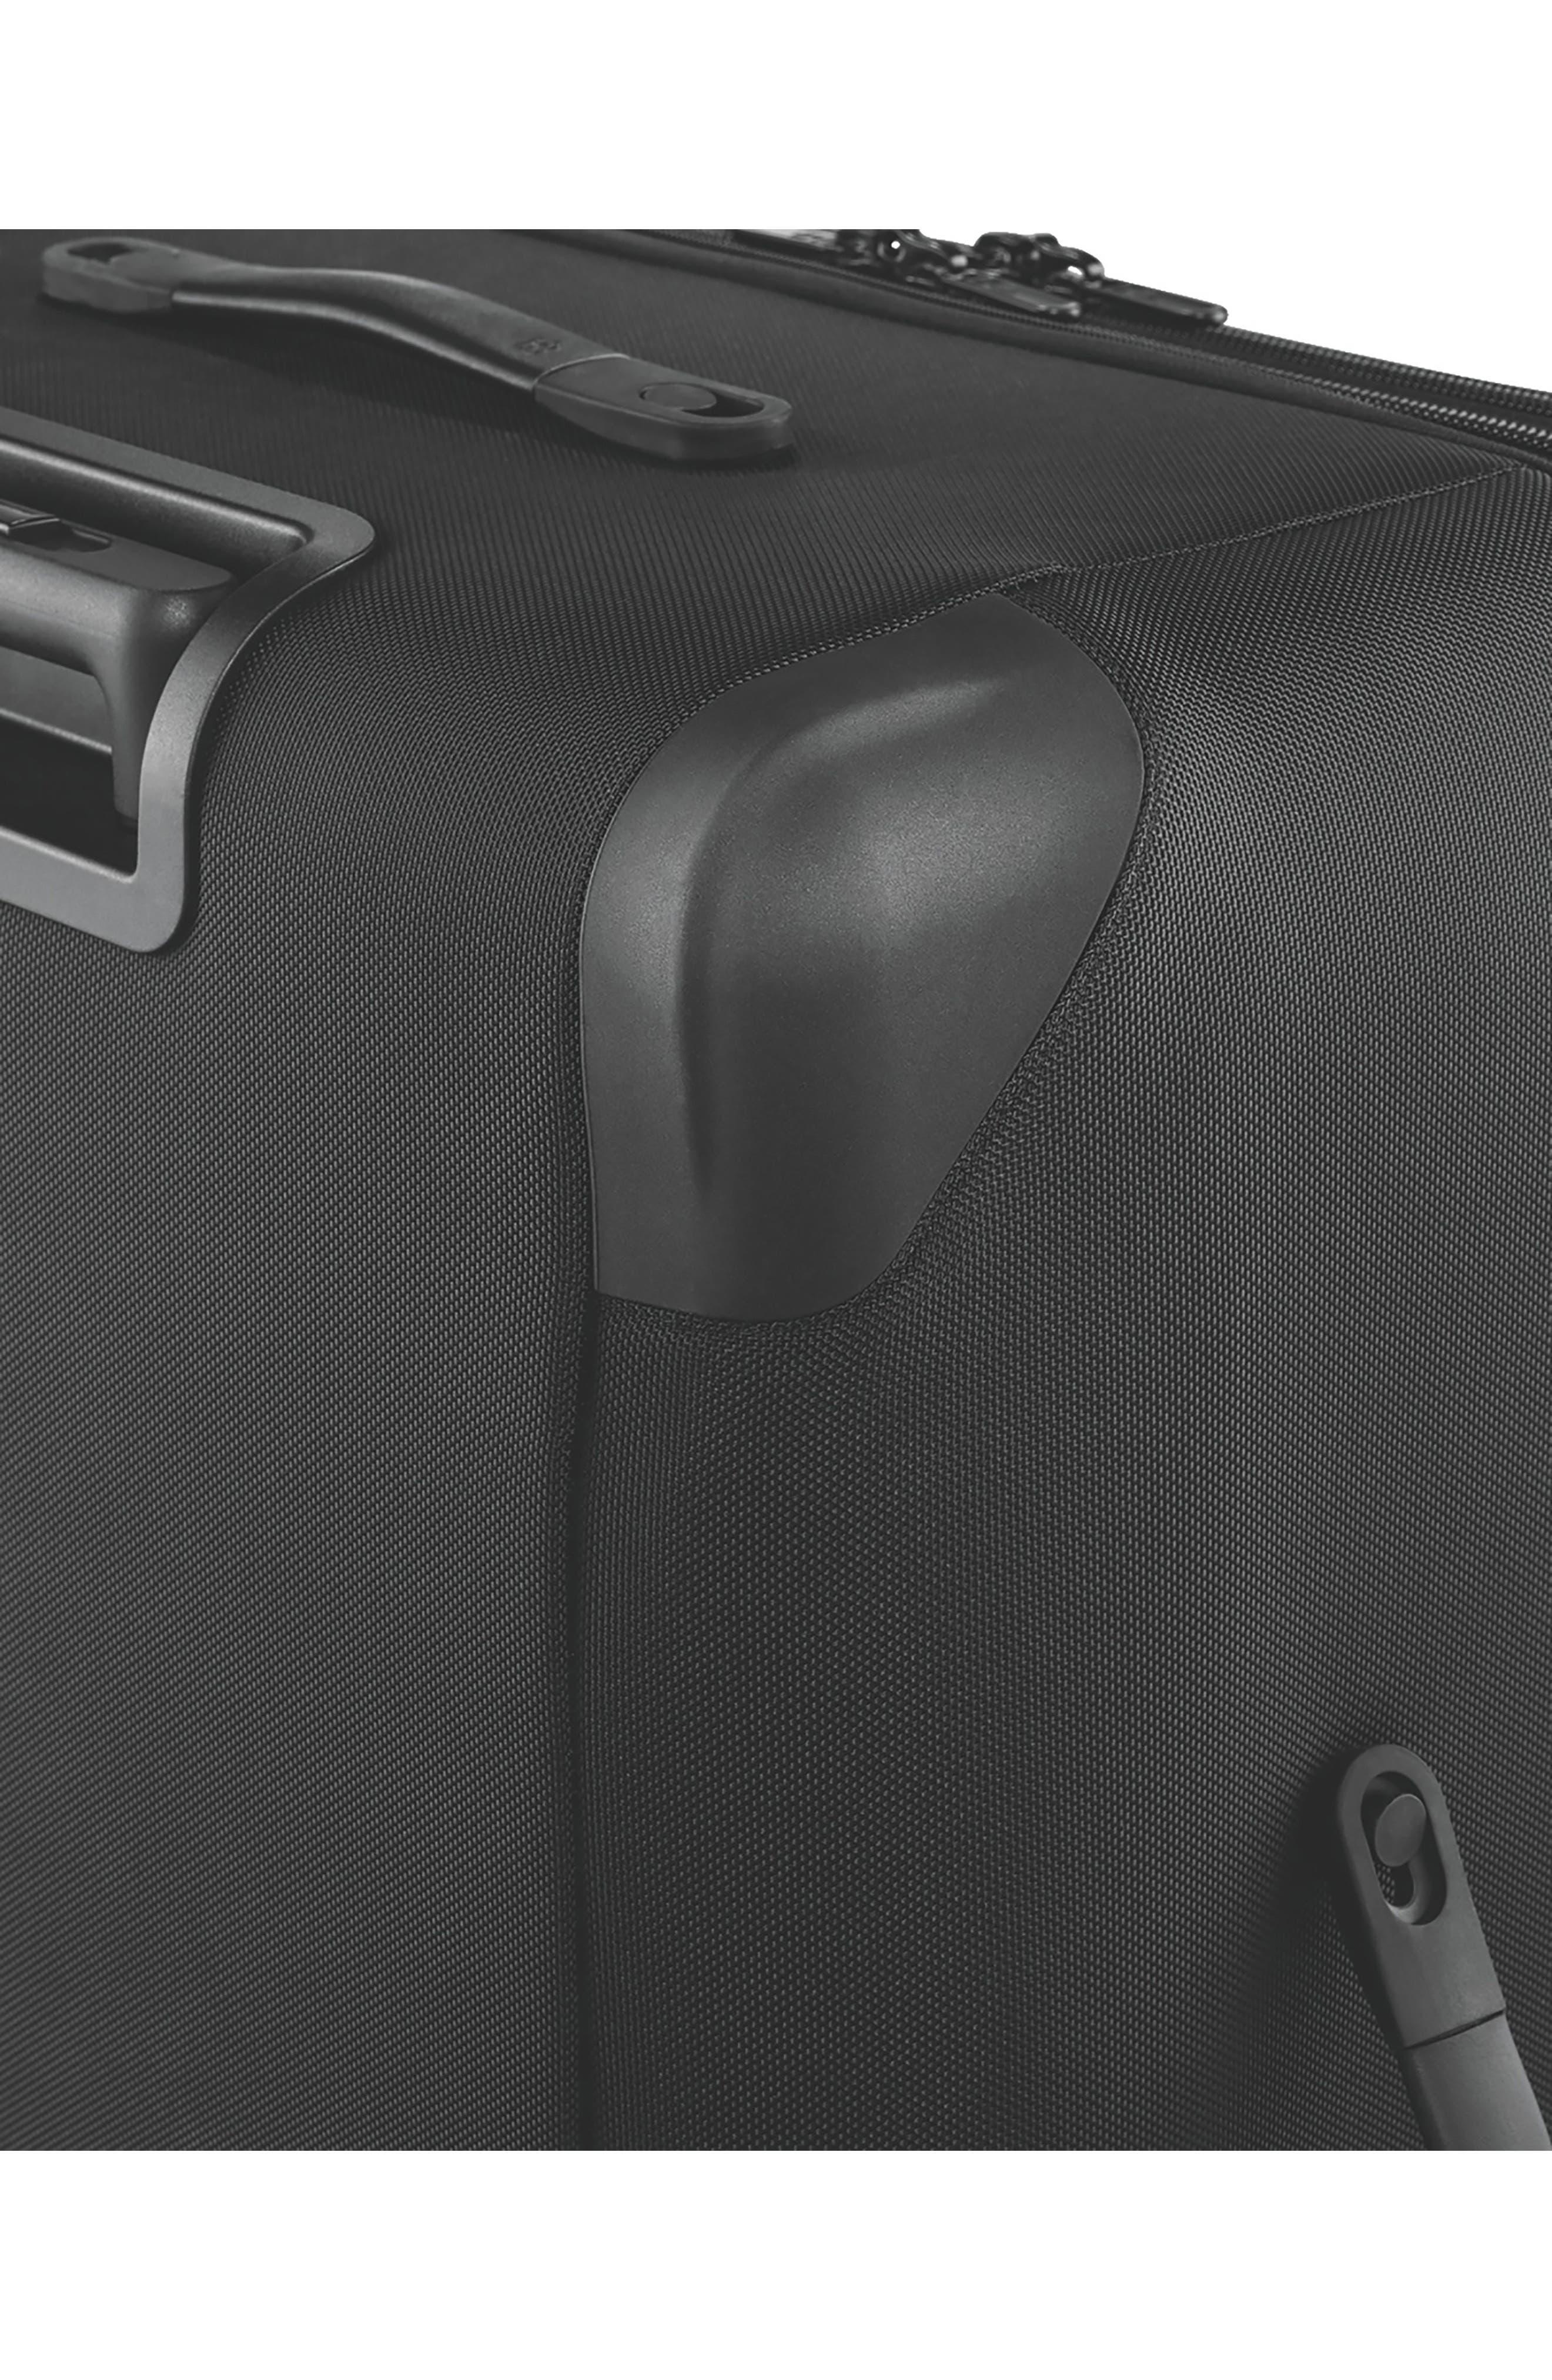 ,                             Lexicon 2.0 26-Inch Wheeled Suitcase,                             Alternate thumbnail 3, color,                             BLACK